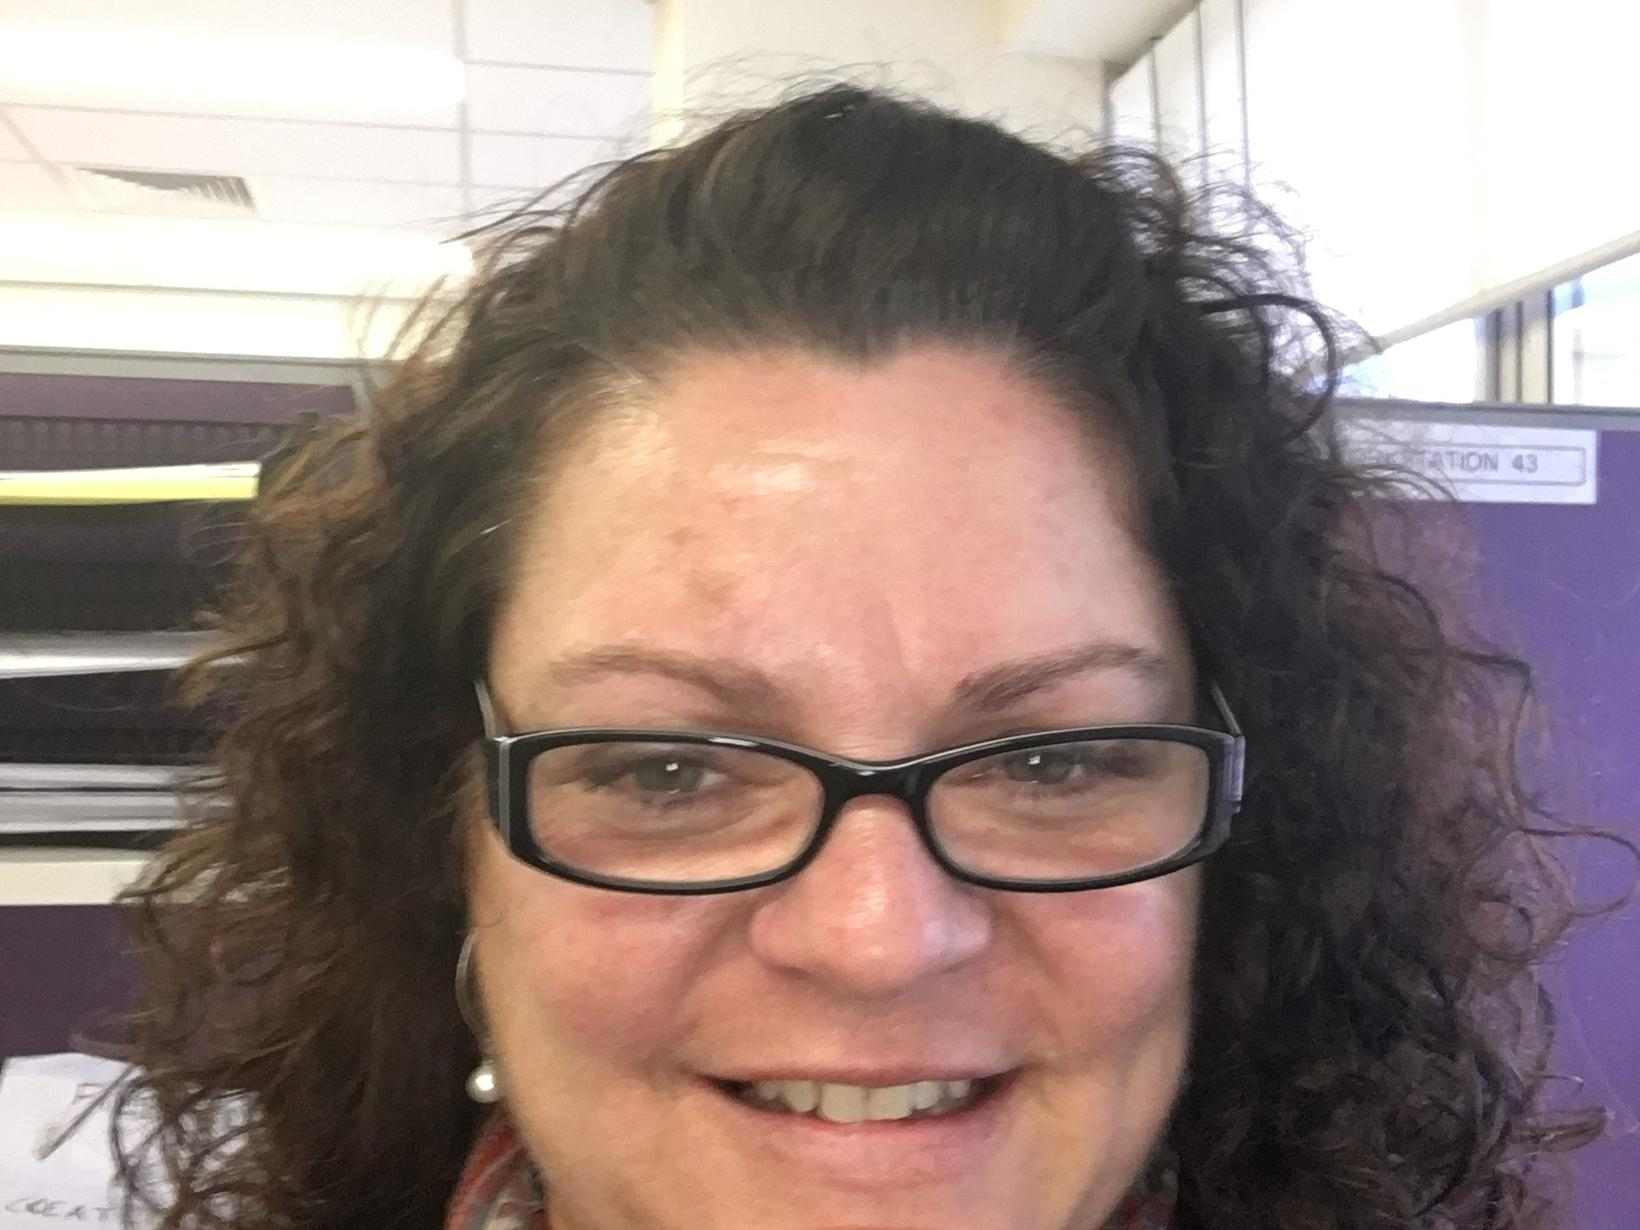 Helen from Frenchville, Queensland, Australia